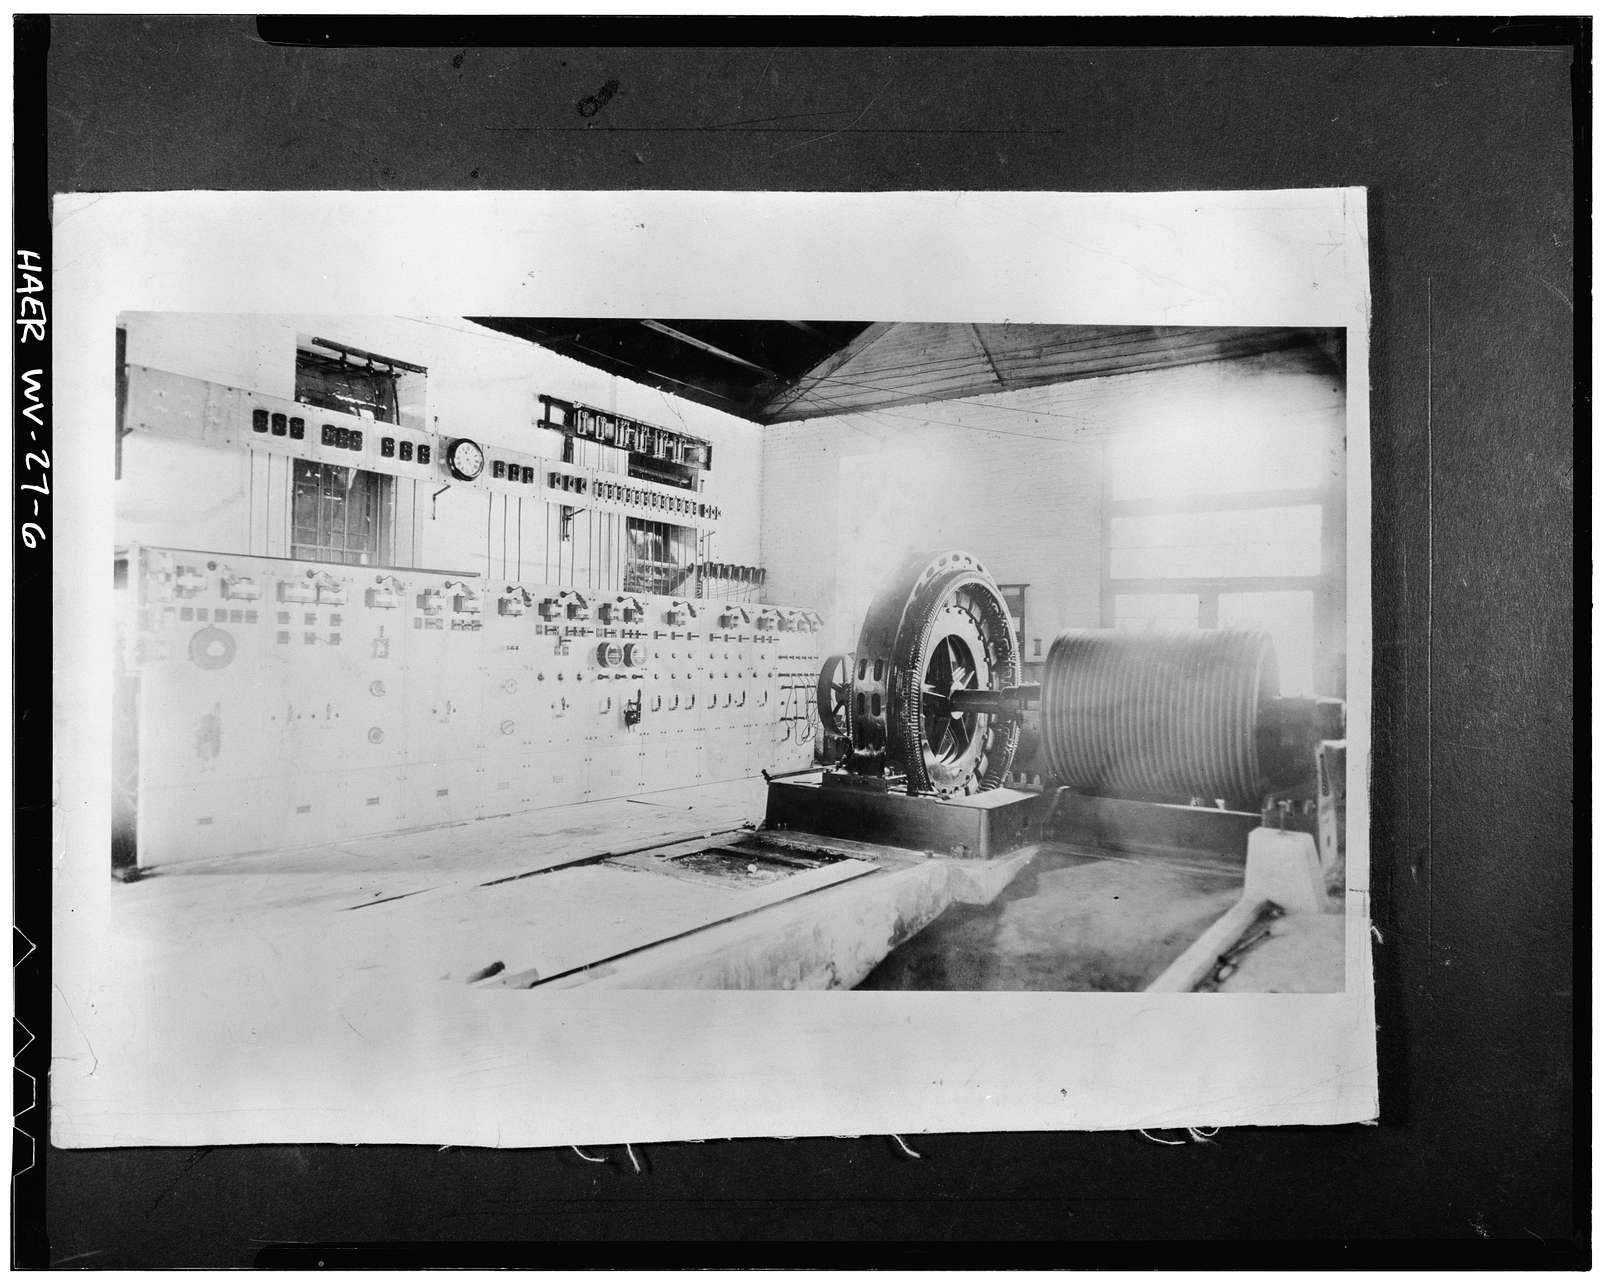 Dam No. 4 Hydroelectric Plant, Potomac River, Martinsburg, Berkeley County, WV